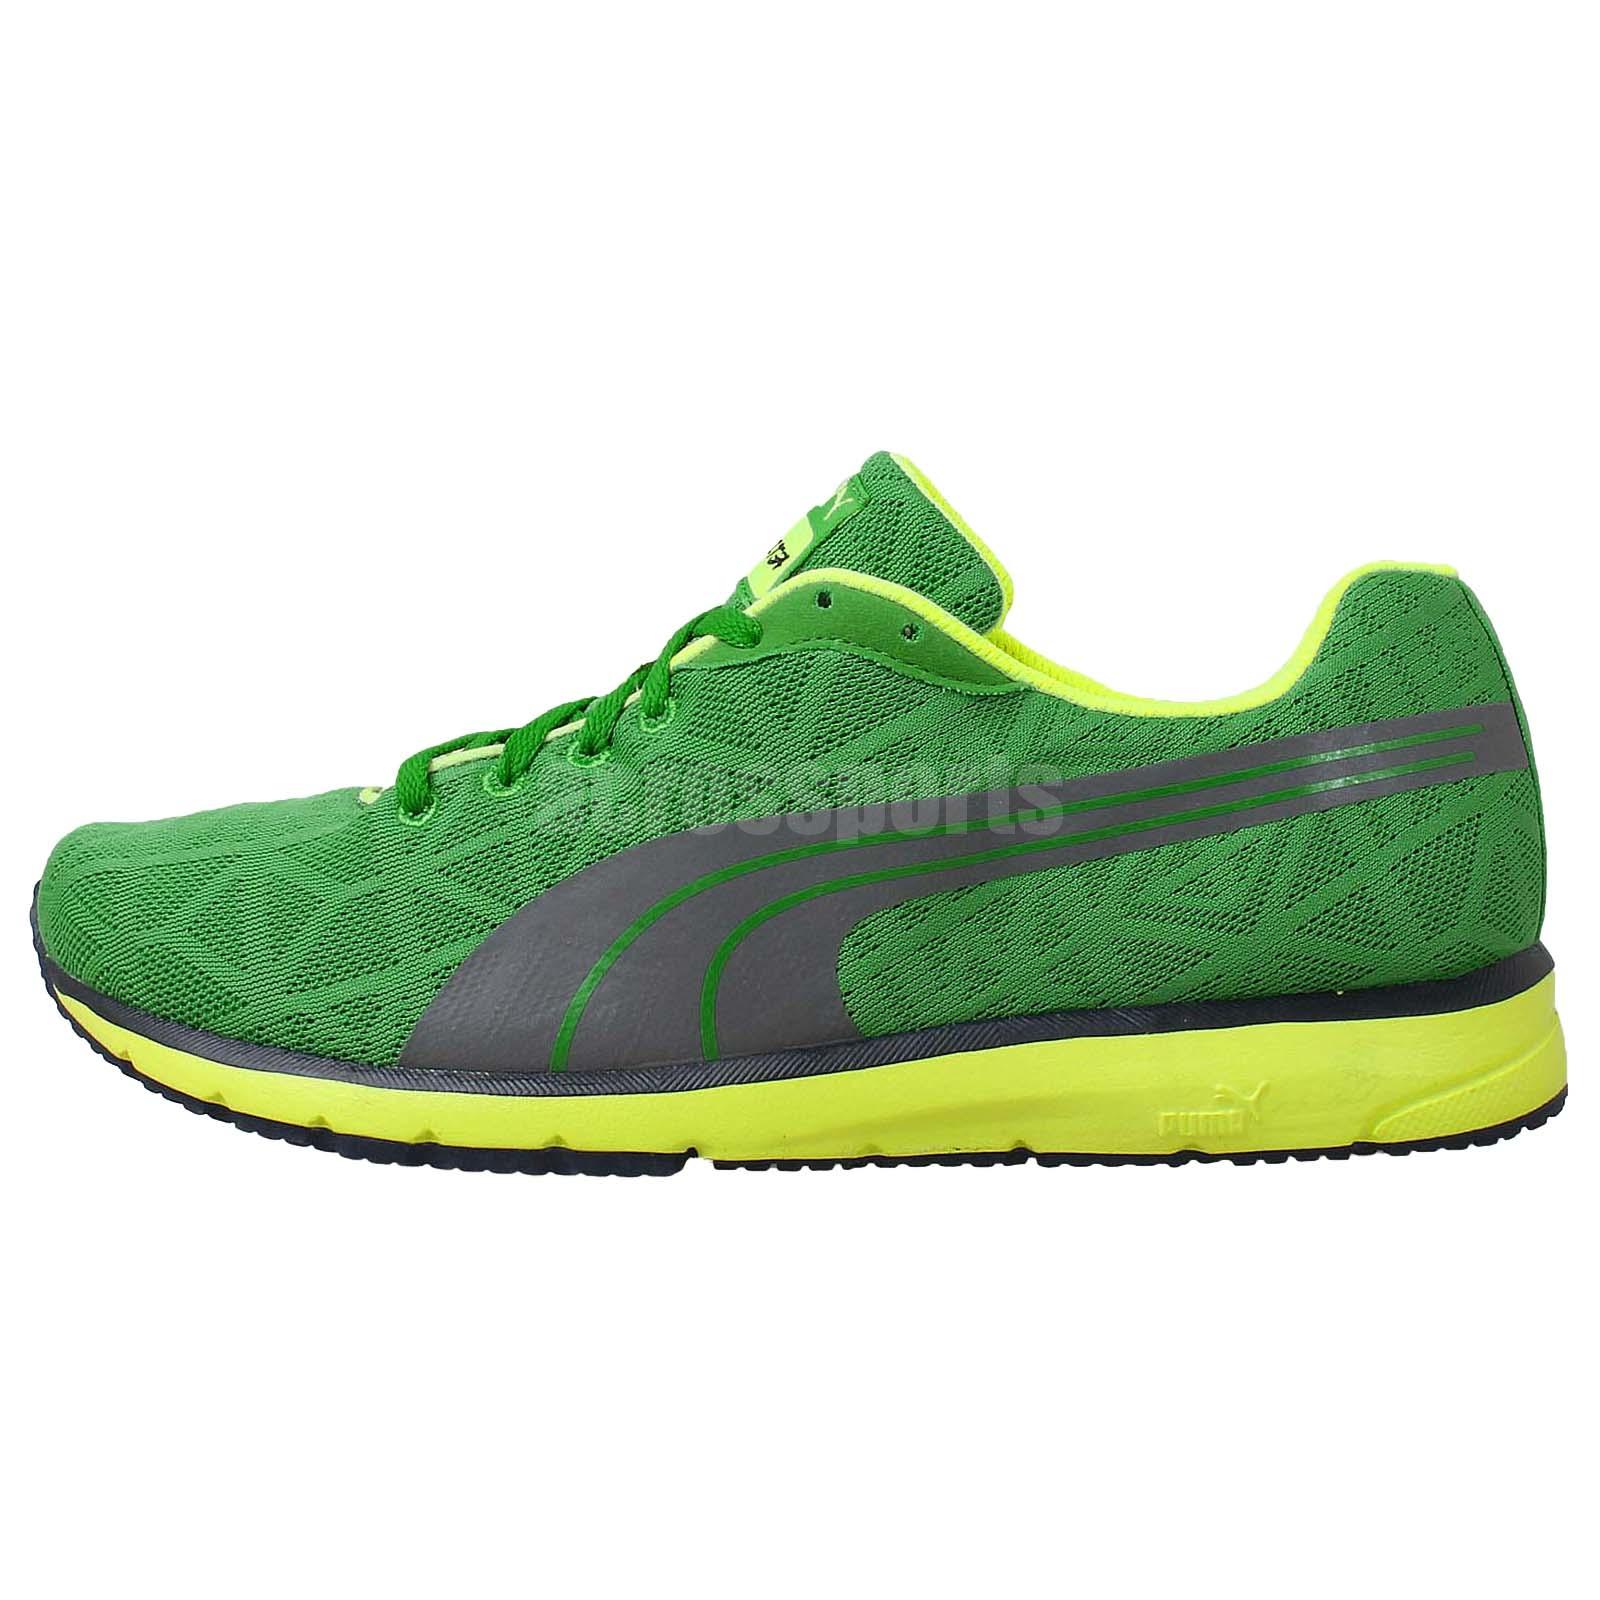 Puma Narita V2 Green Yellow 2014 Mens Running Shoes Runner